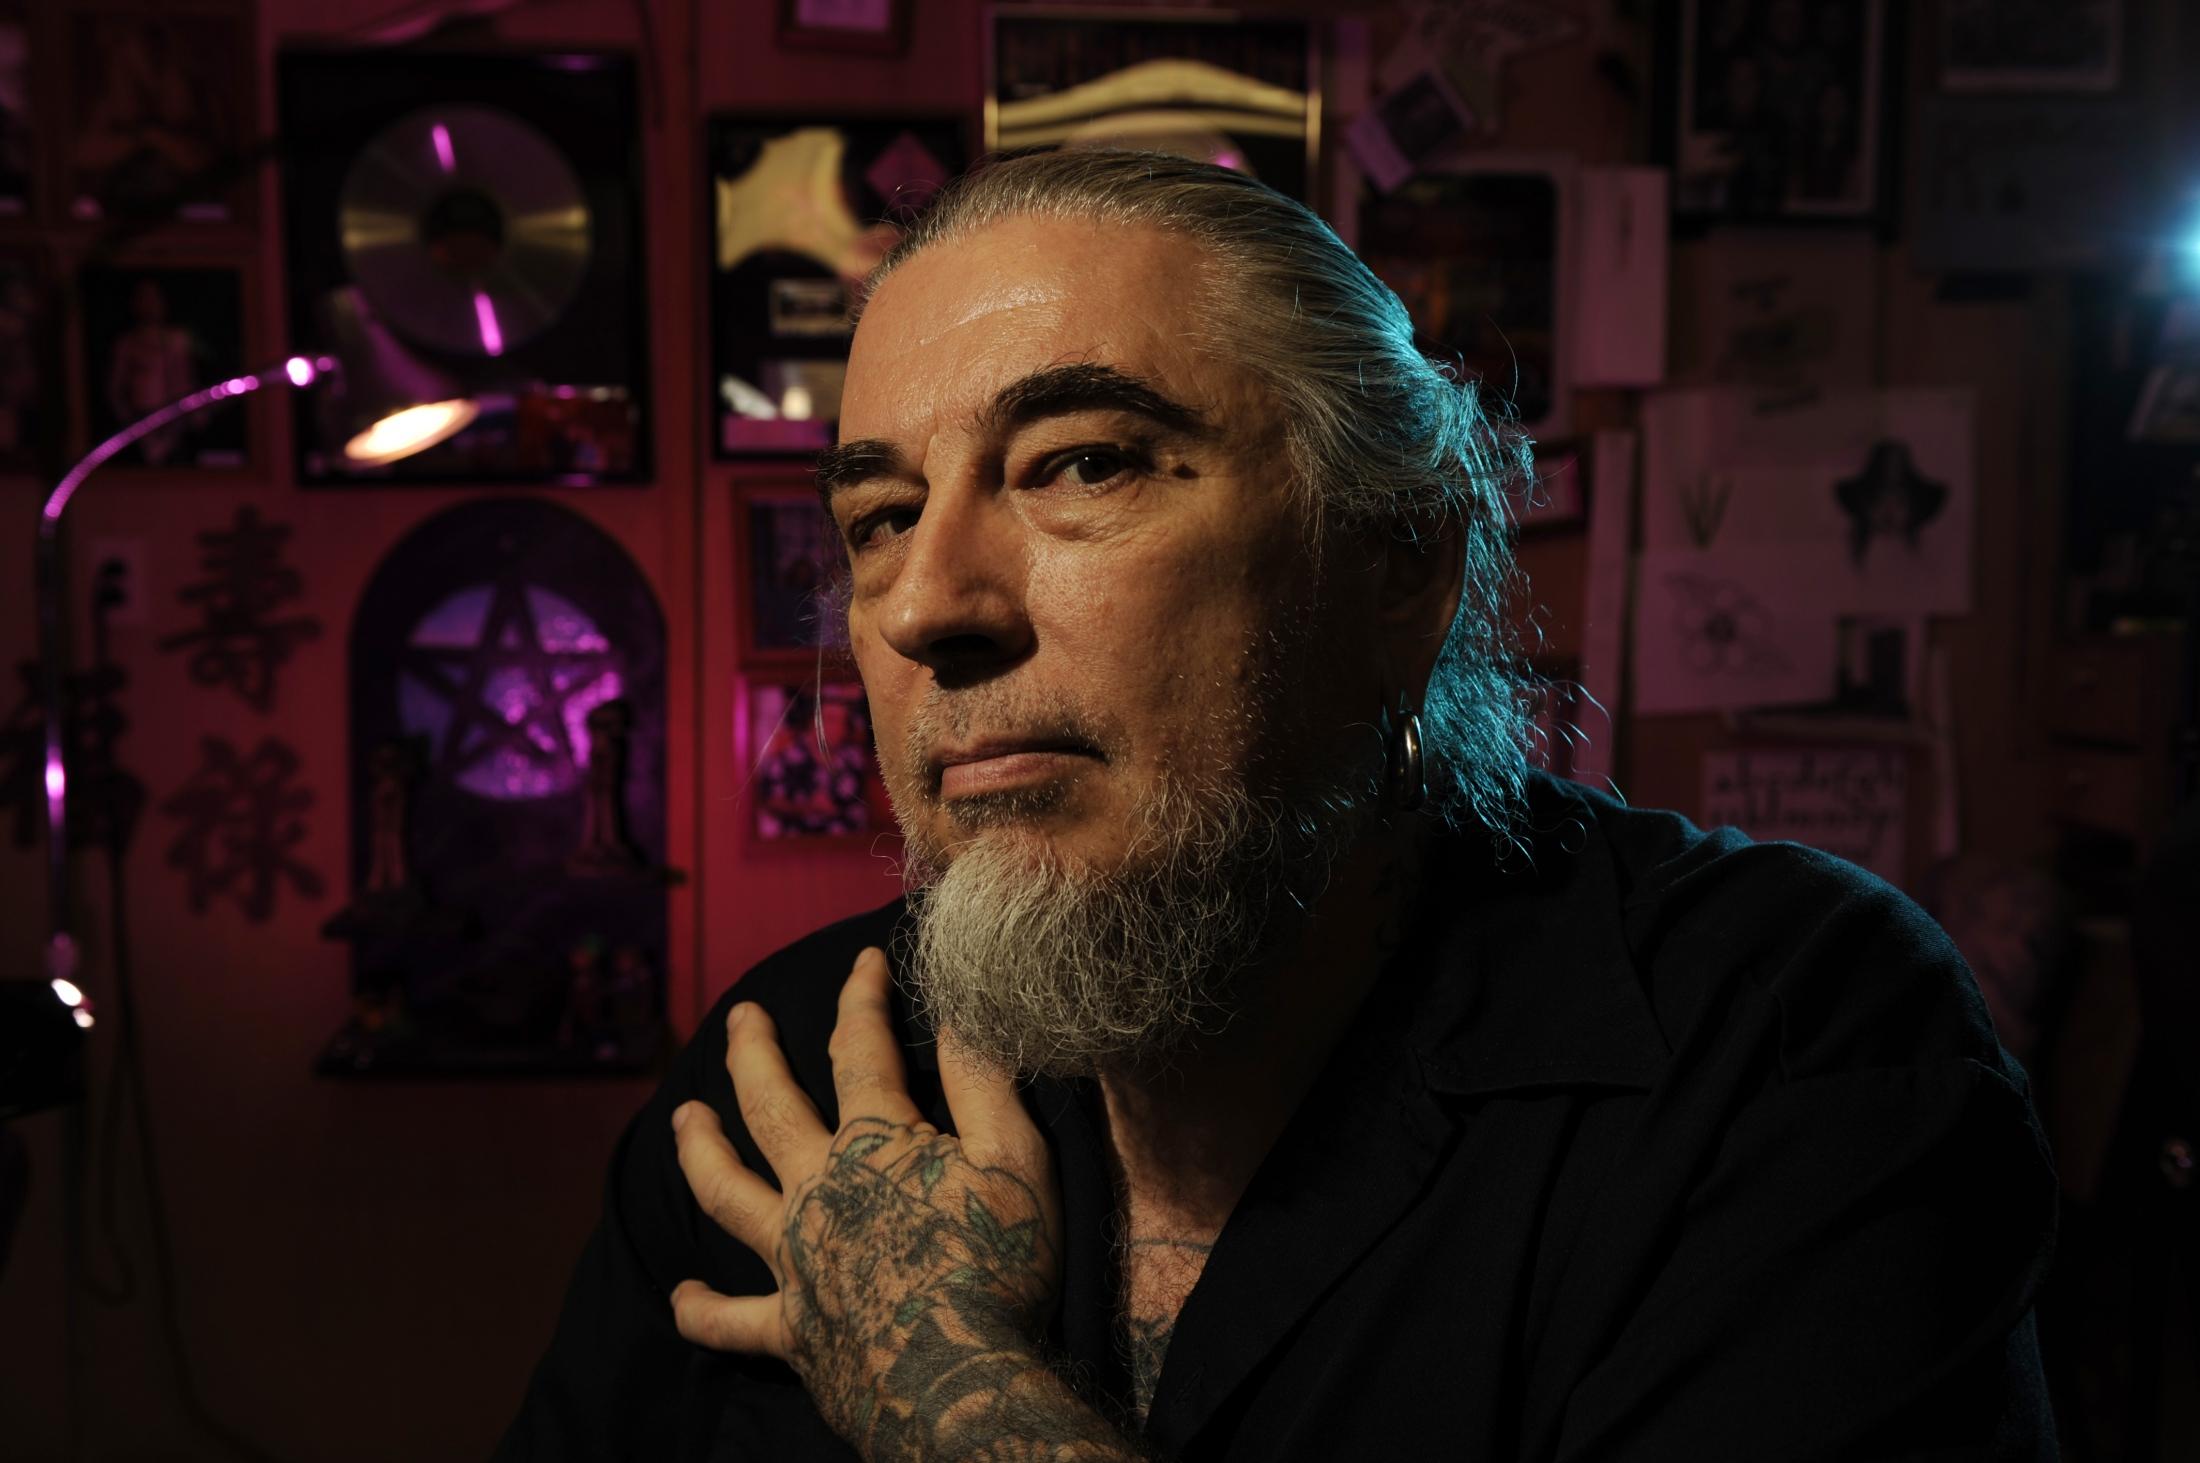 Tattoo artist Rockwood Photographed in Kailua-Kona, Hawaii